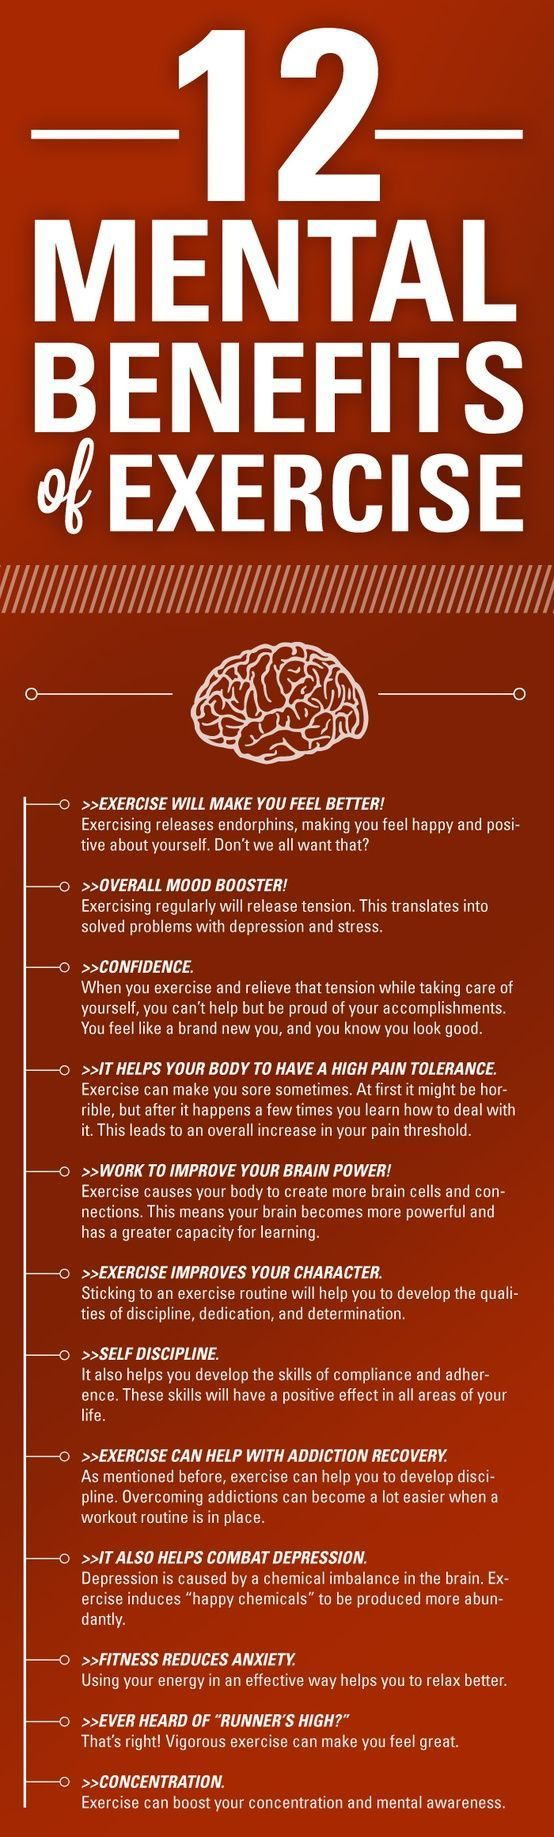 12 Mental Benefits of Regular Exercise